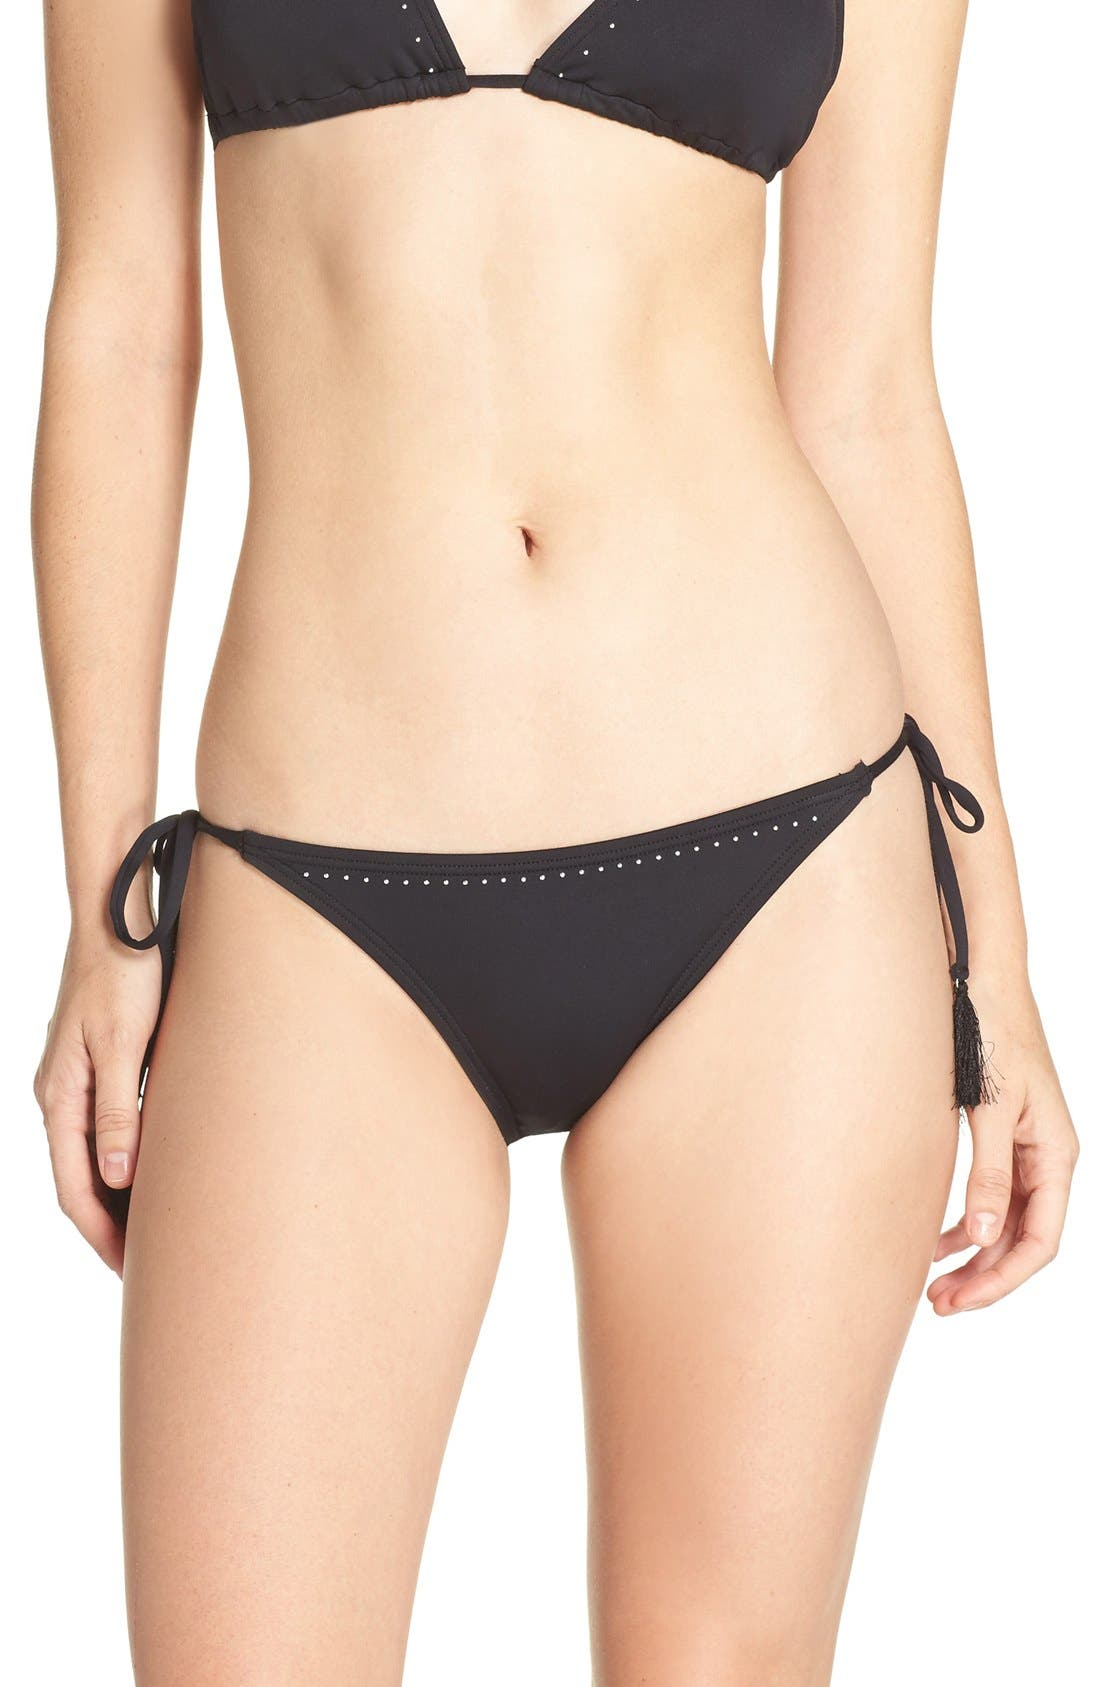 Vince Camuto Side Tie Bikini Bottoms